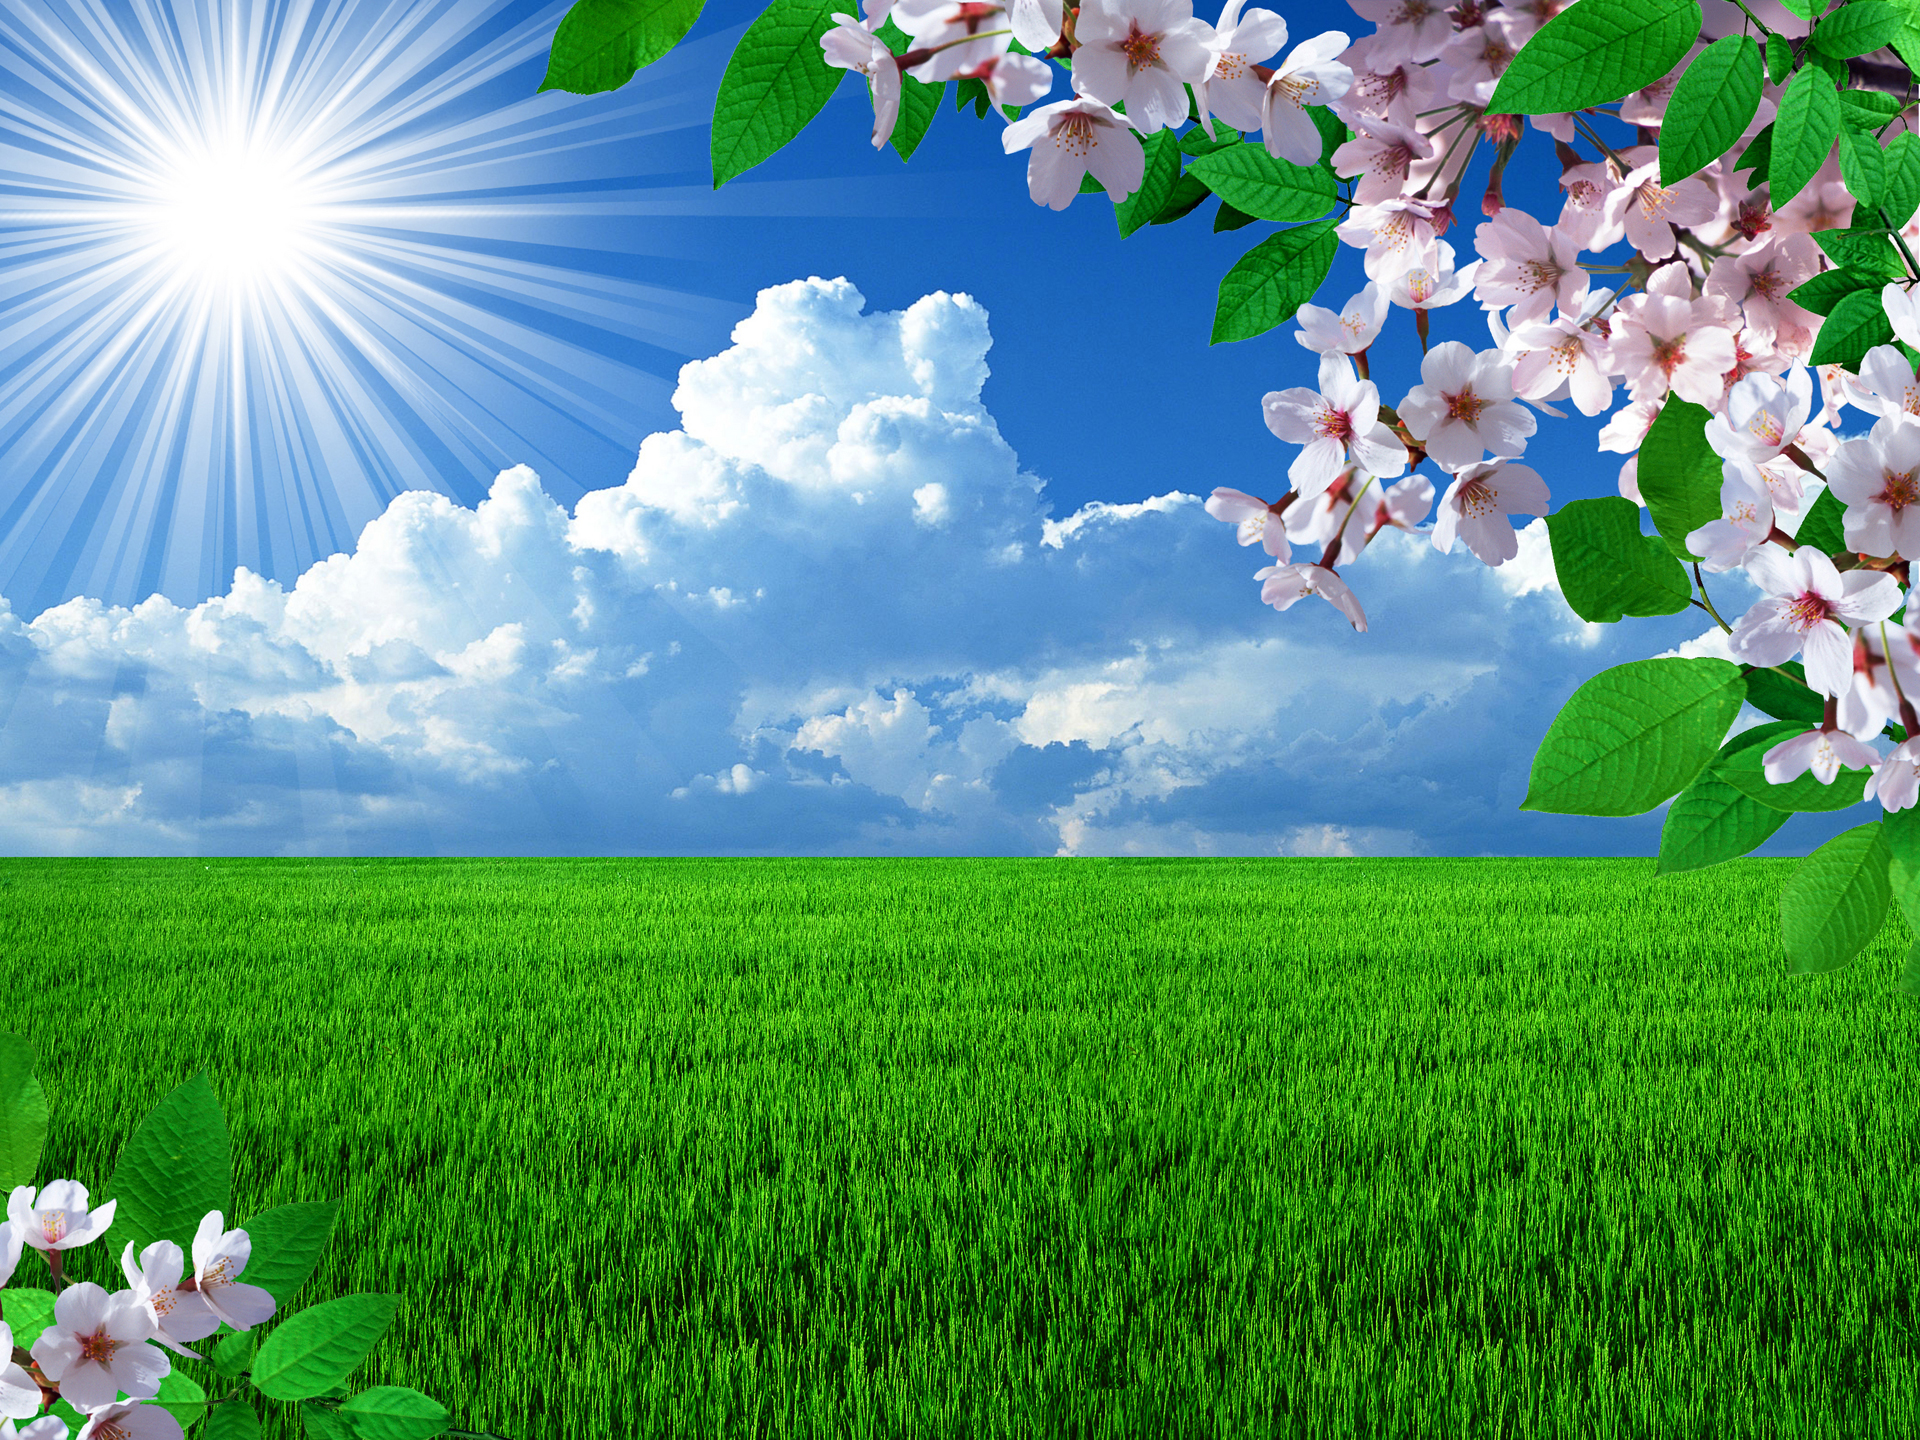 free spring desktop themes 1920x1440